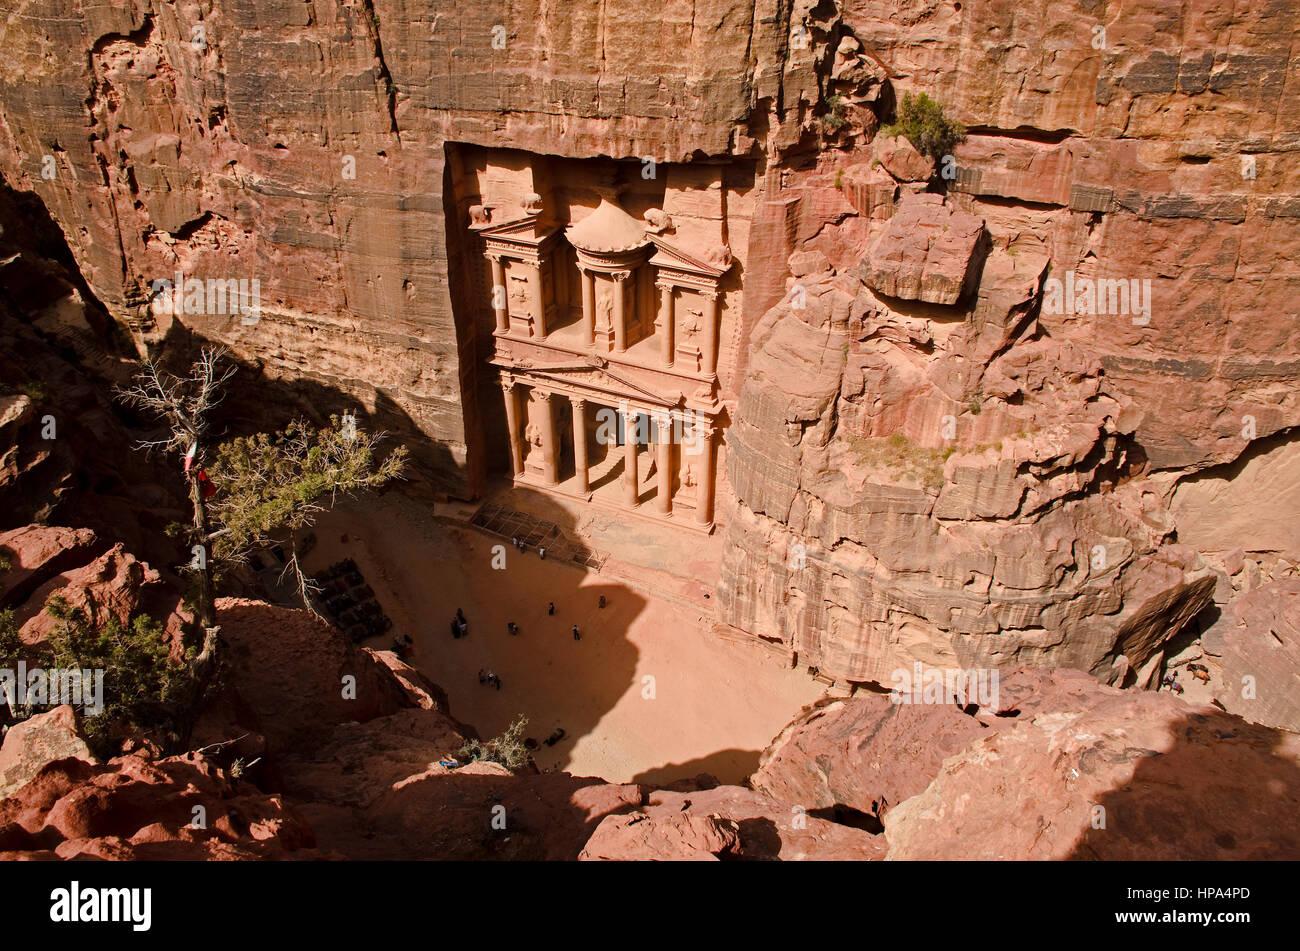 The Treasury at Petra - Stock Image